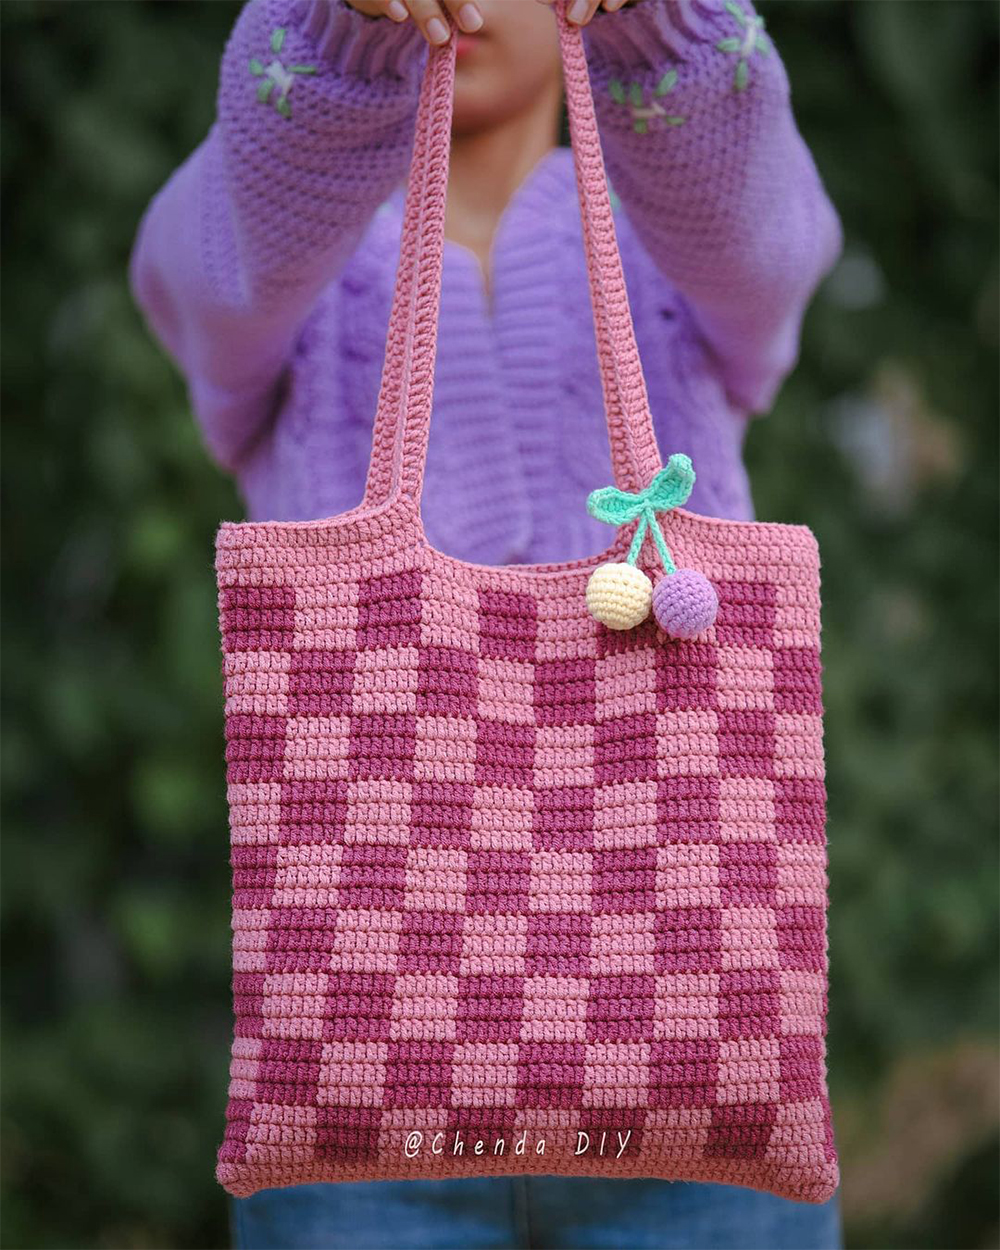 Crochet Checkered Tote Bag